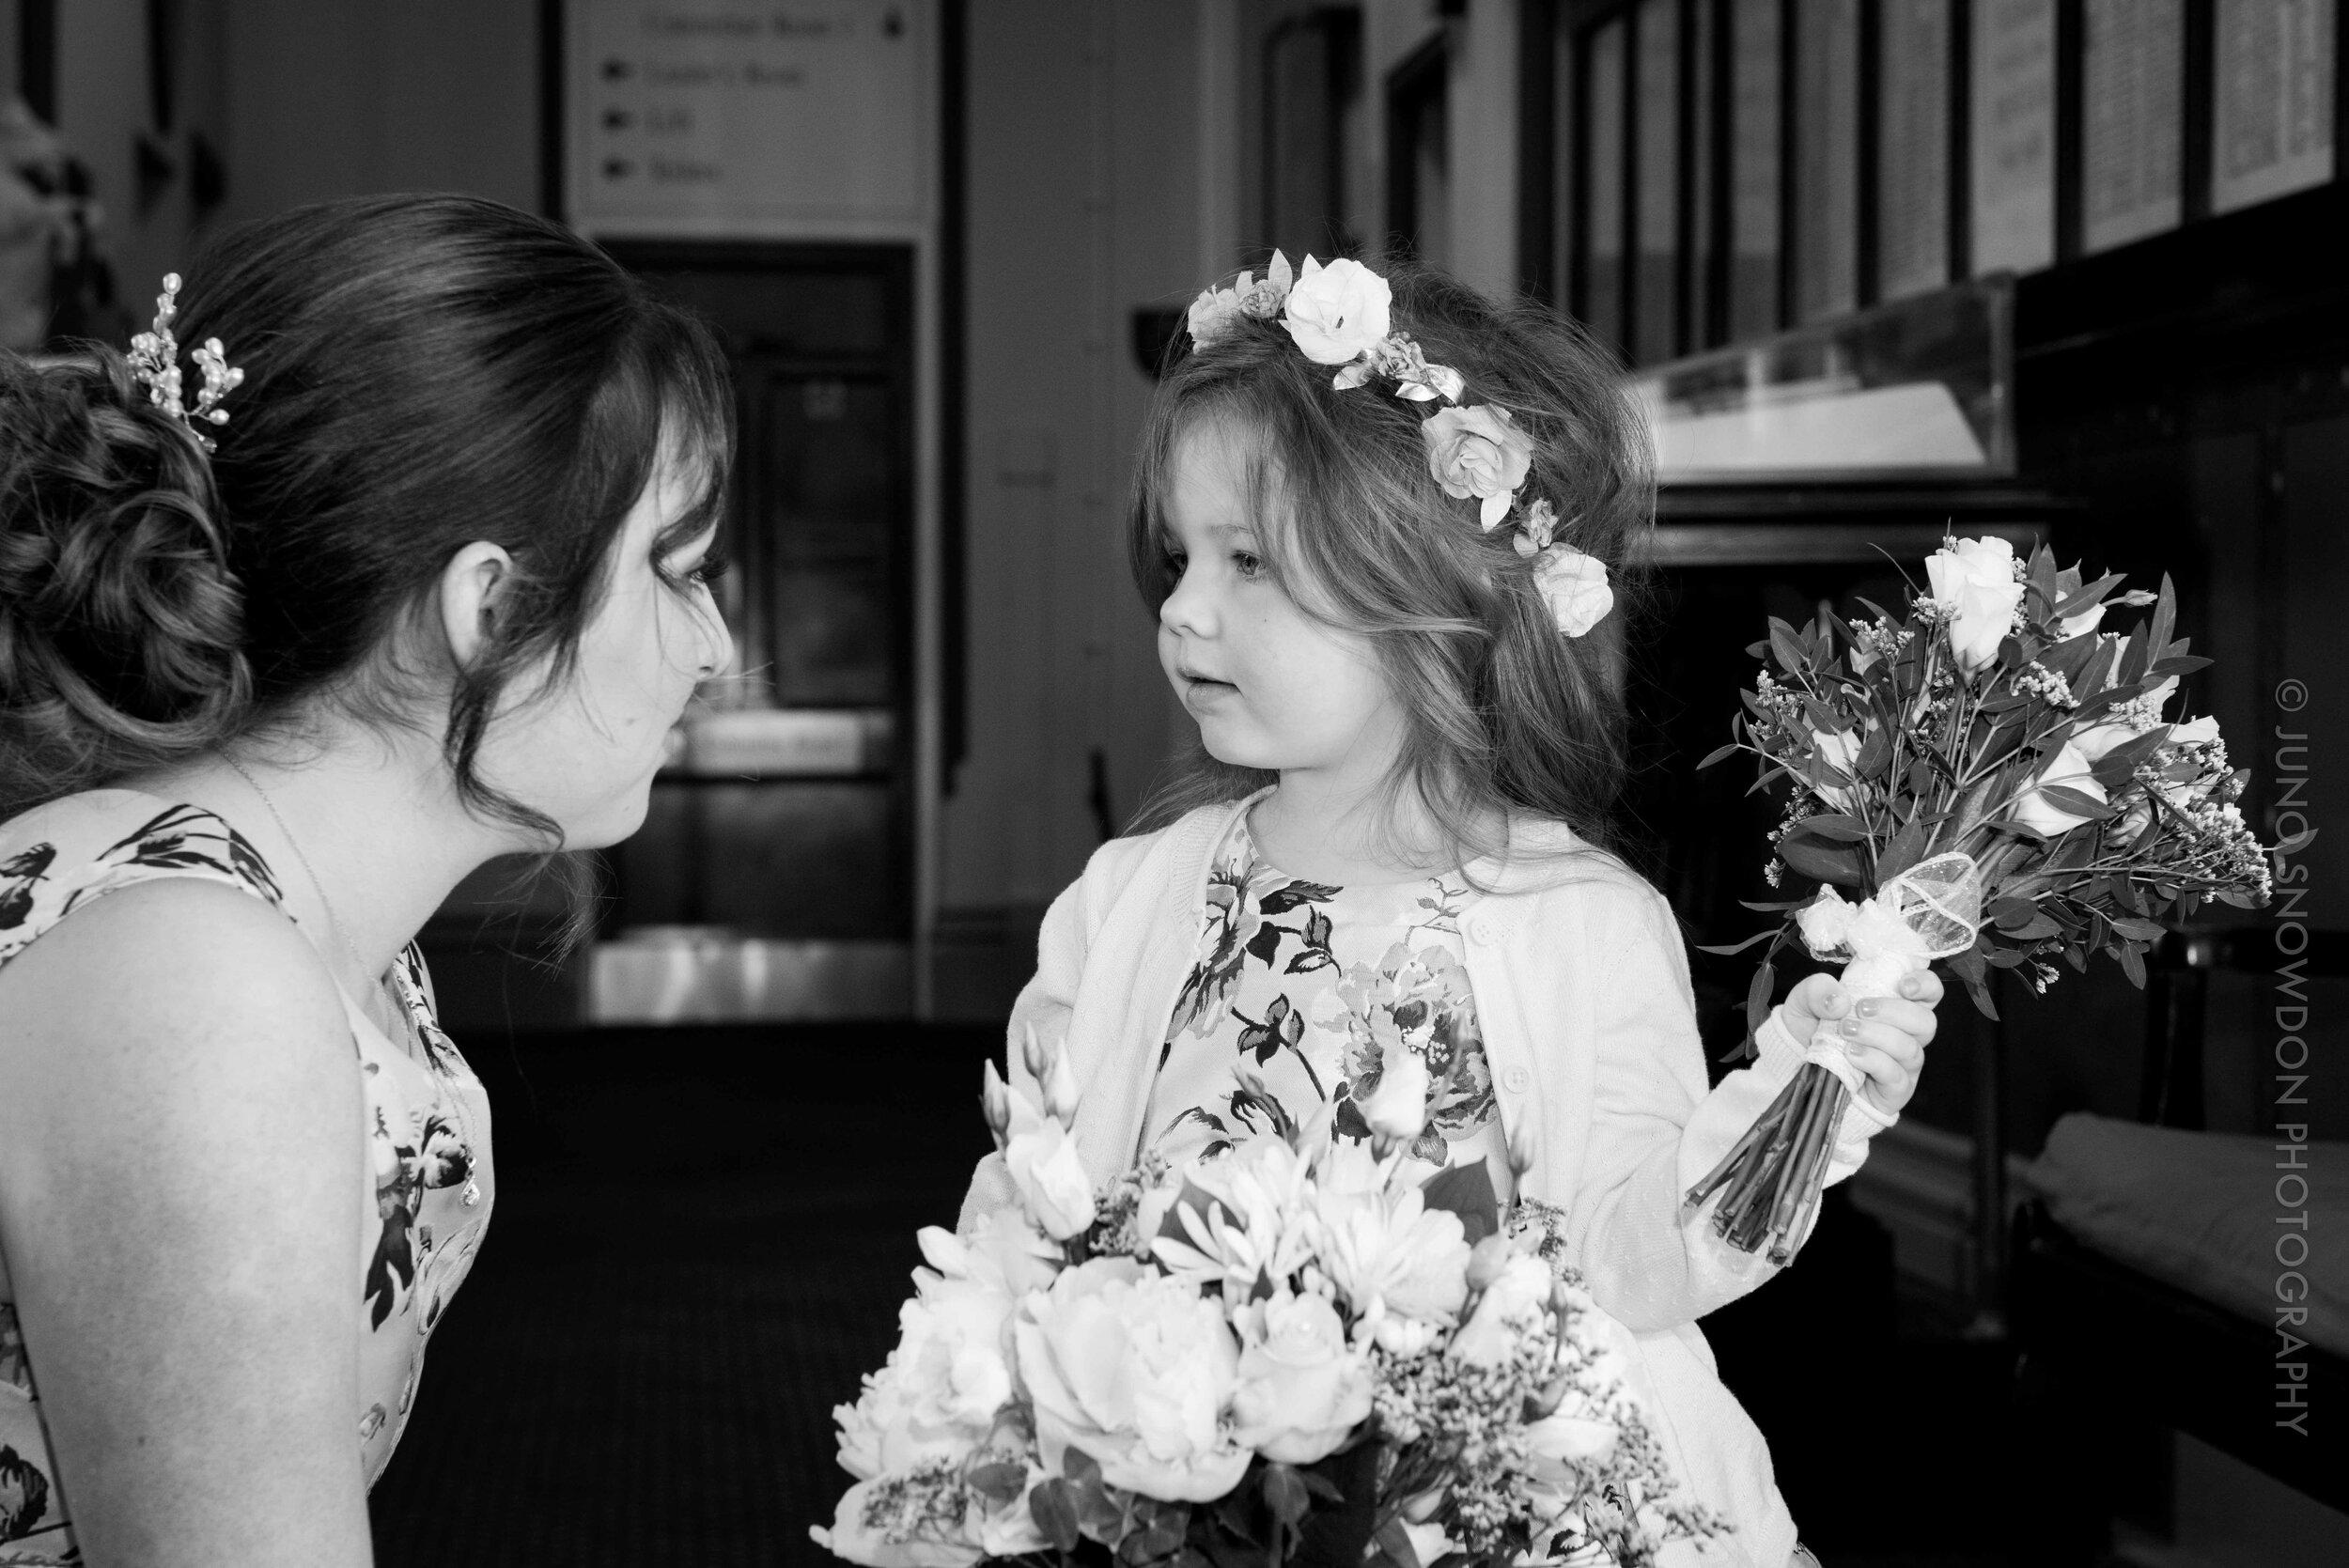 juno-snowdon-photography-wedding-7209.jpg